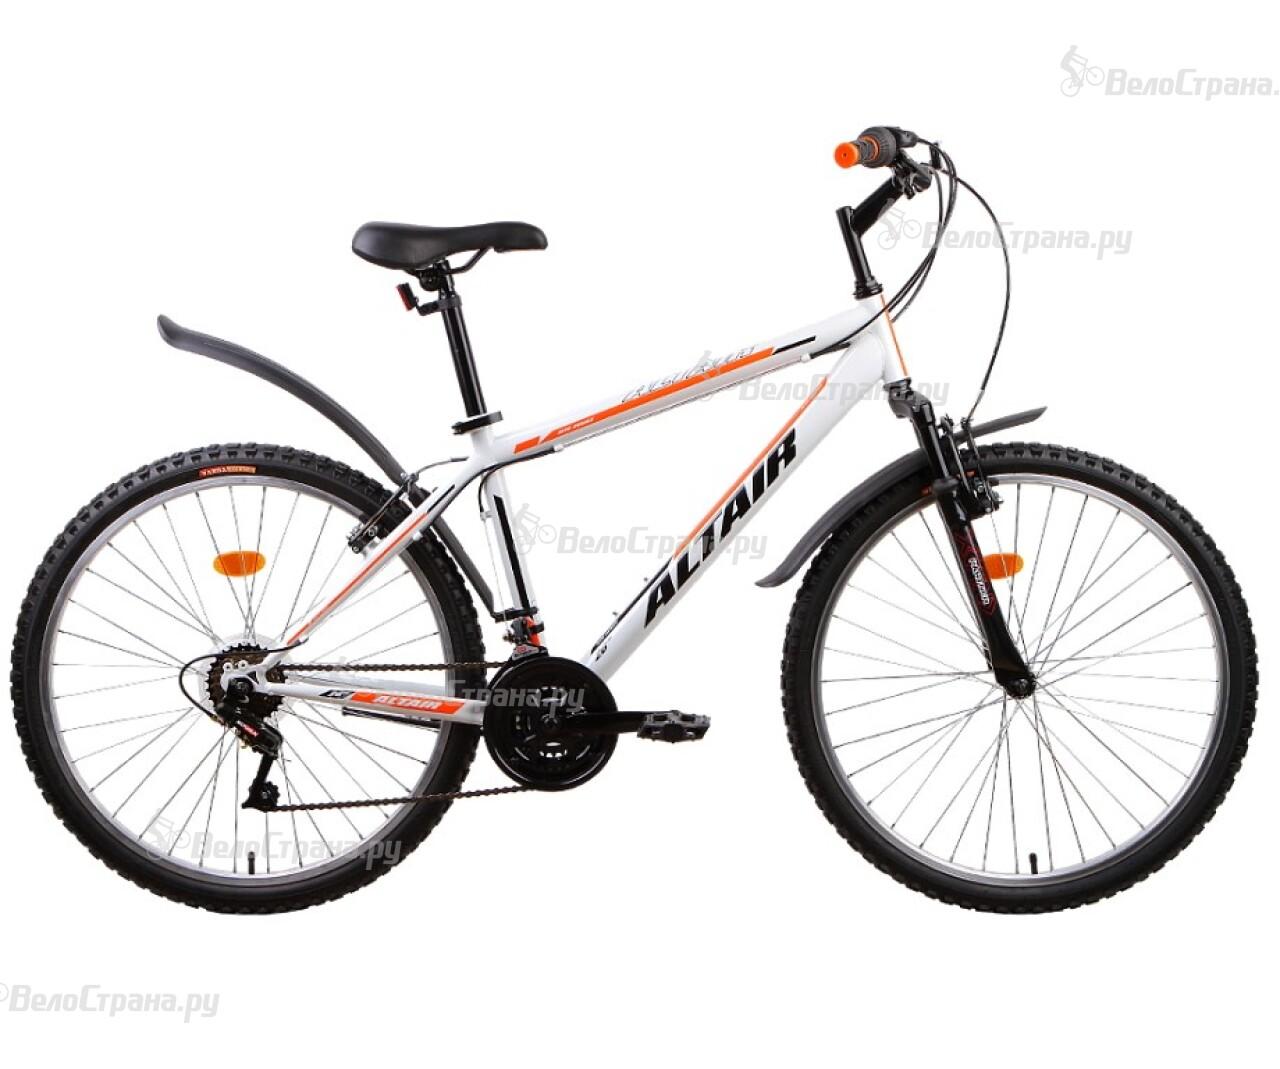 Велосипед Forward Altair MTB HT 26 (2015) велосипед altair city high 28 19 2015 dark blue